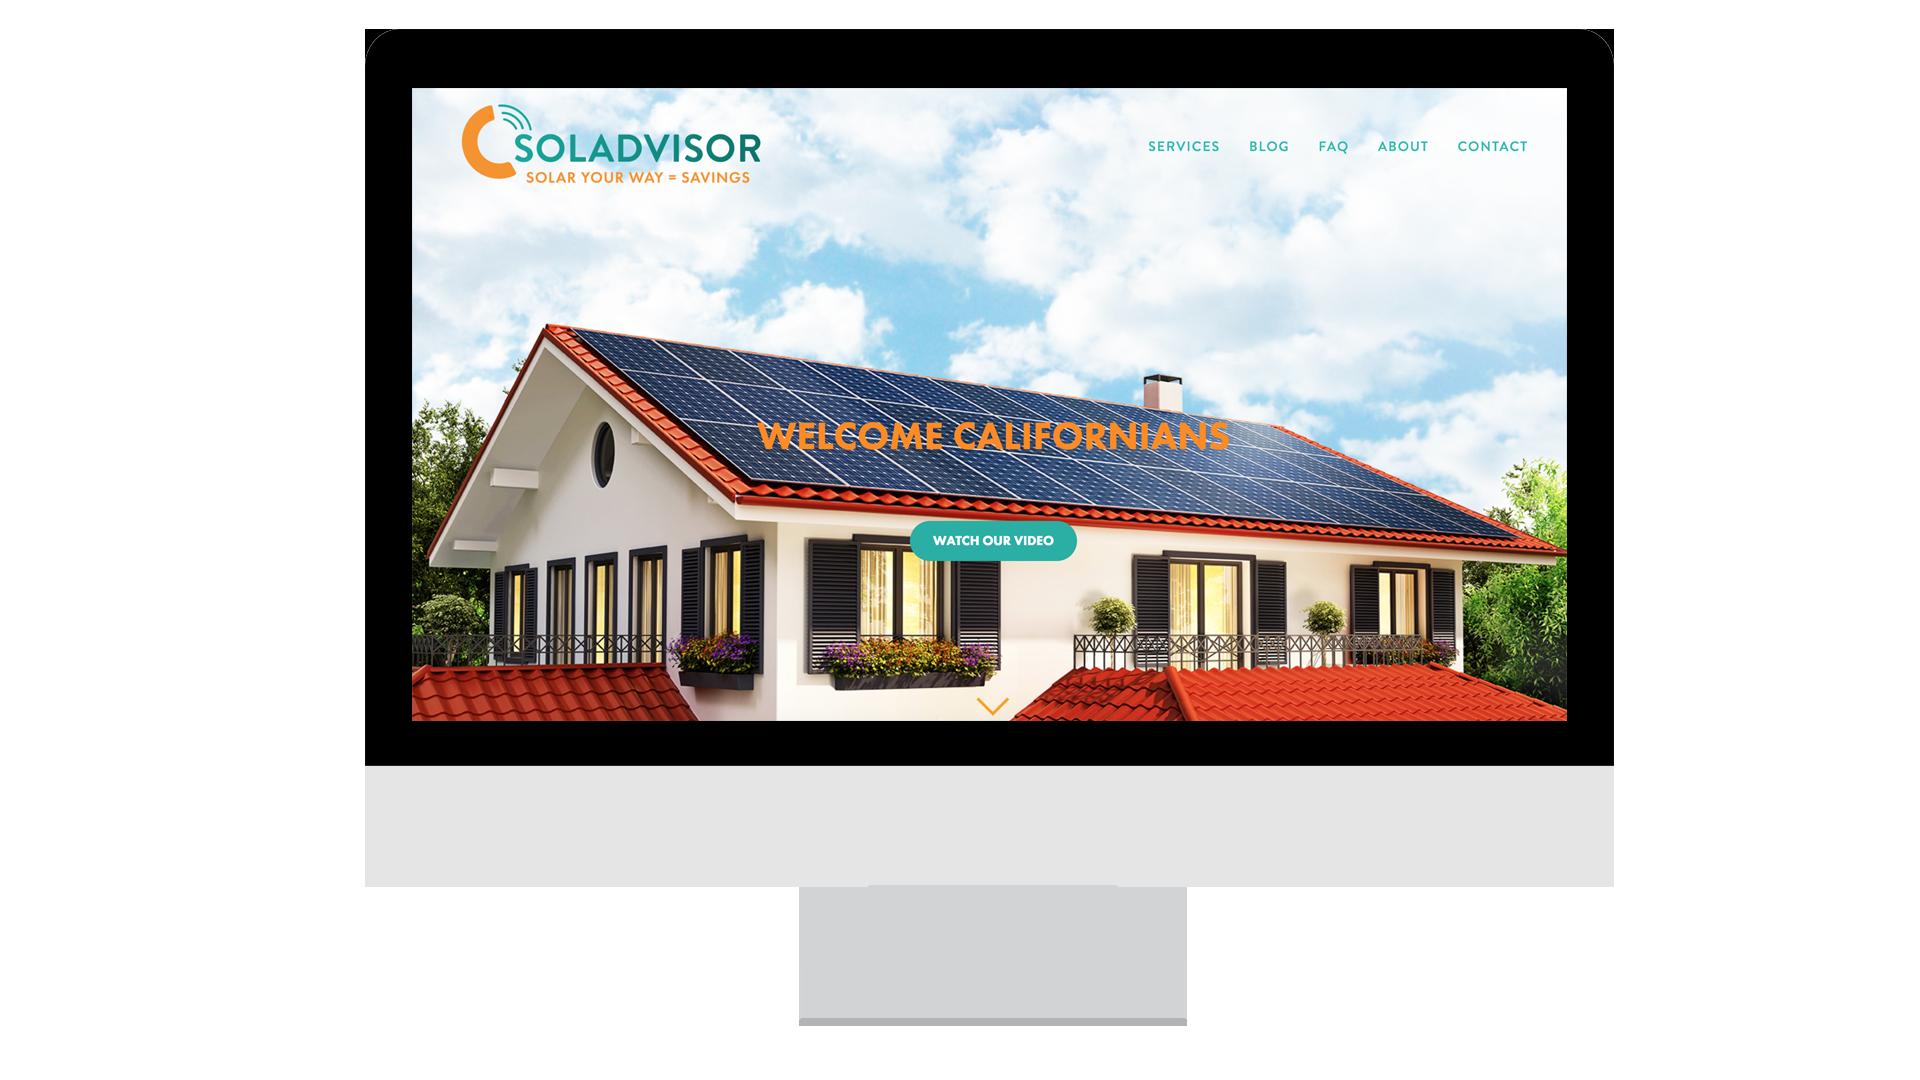 Soladvisor Website 01.png